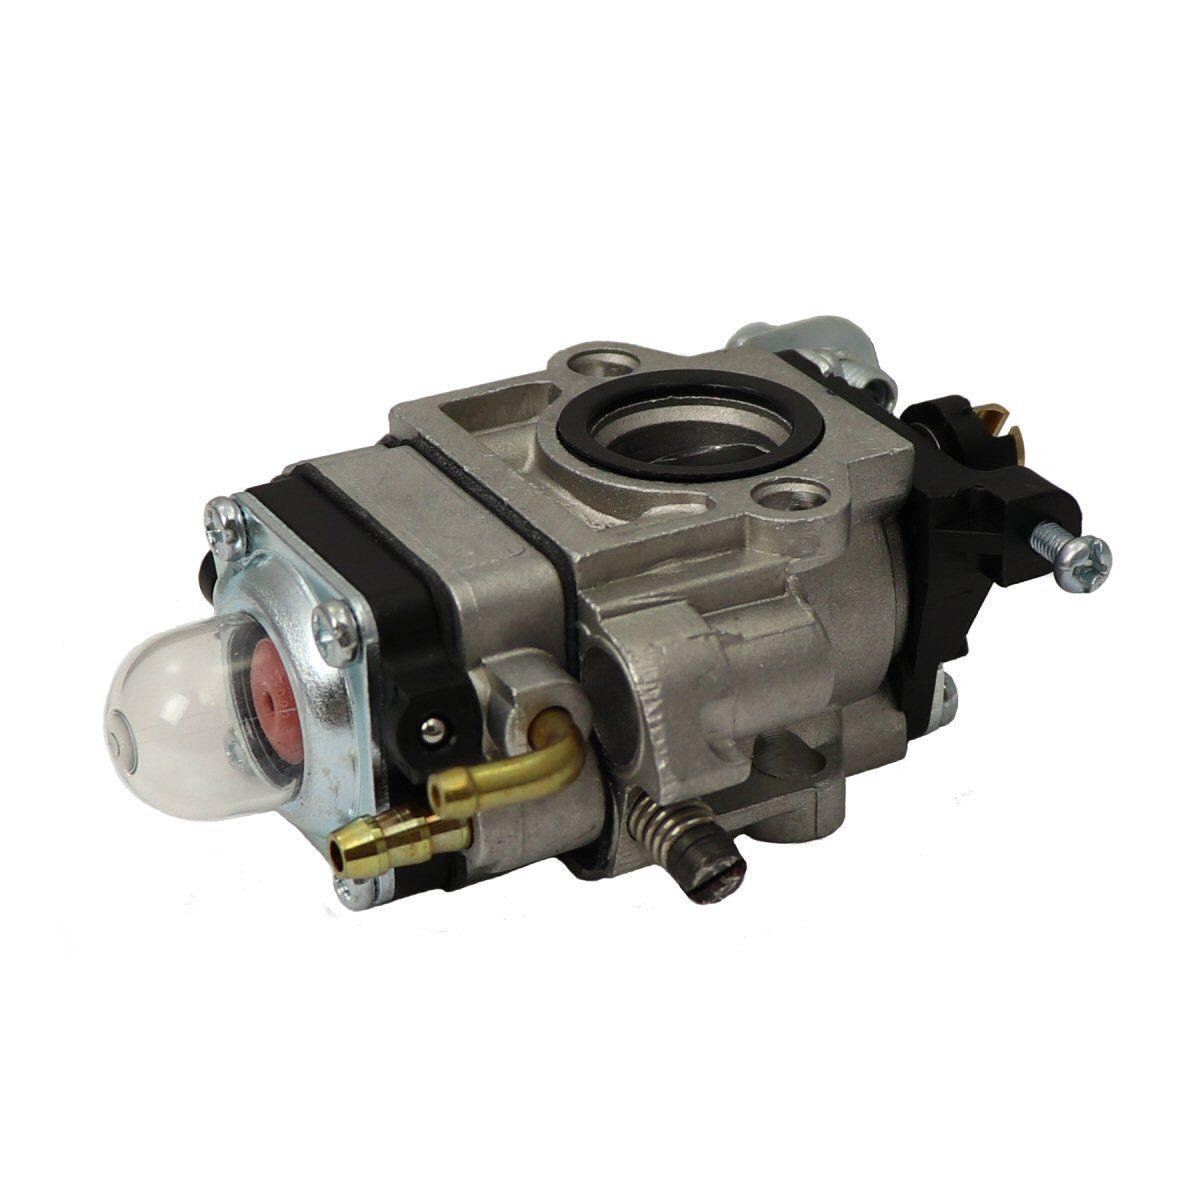 15mm 2-stroke Carburetor